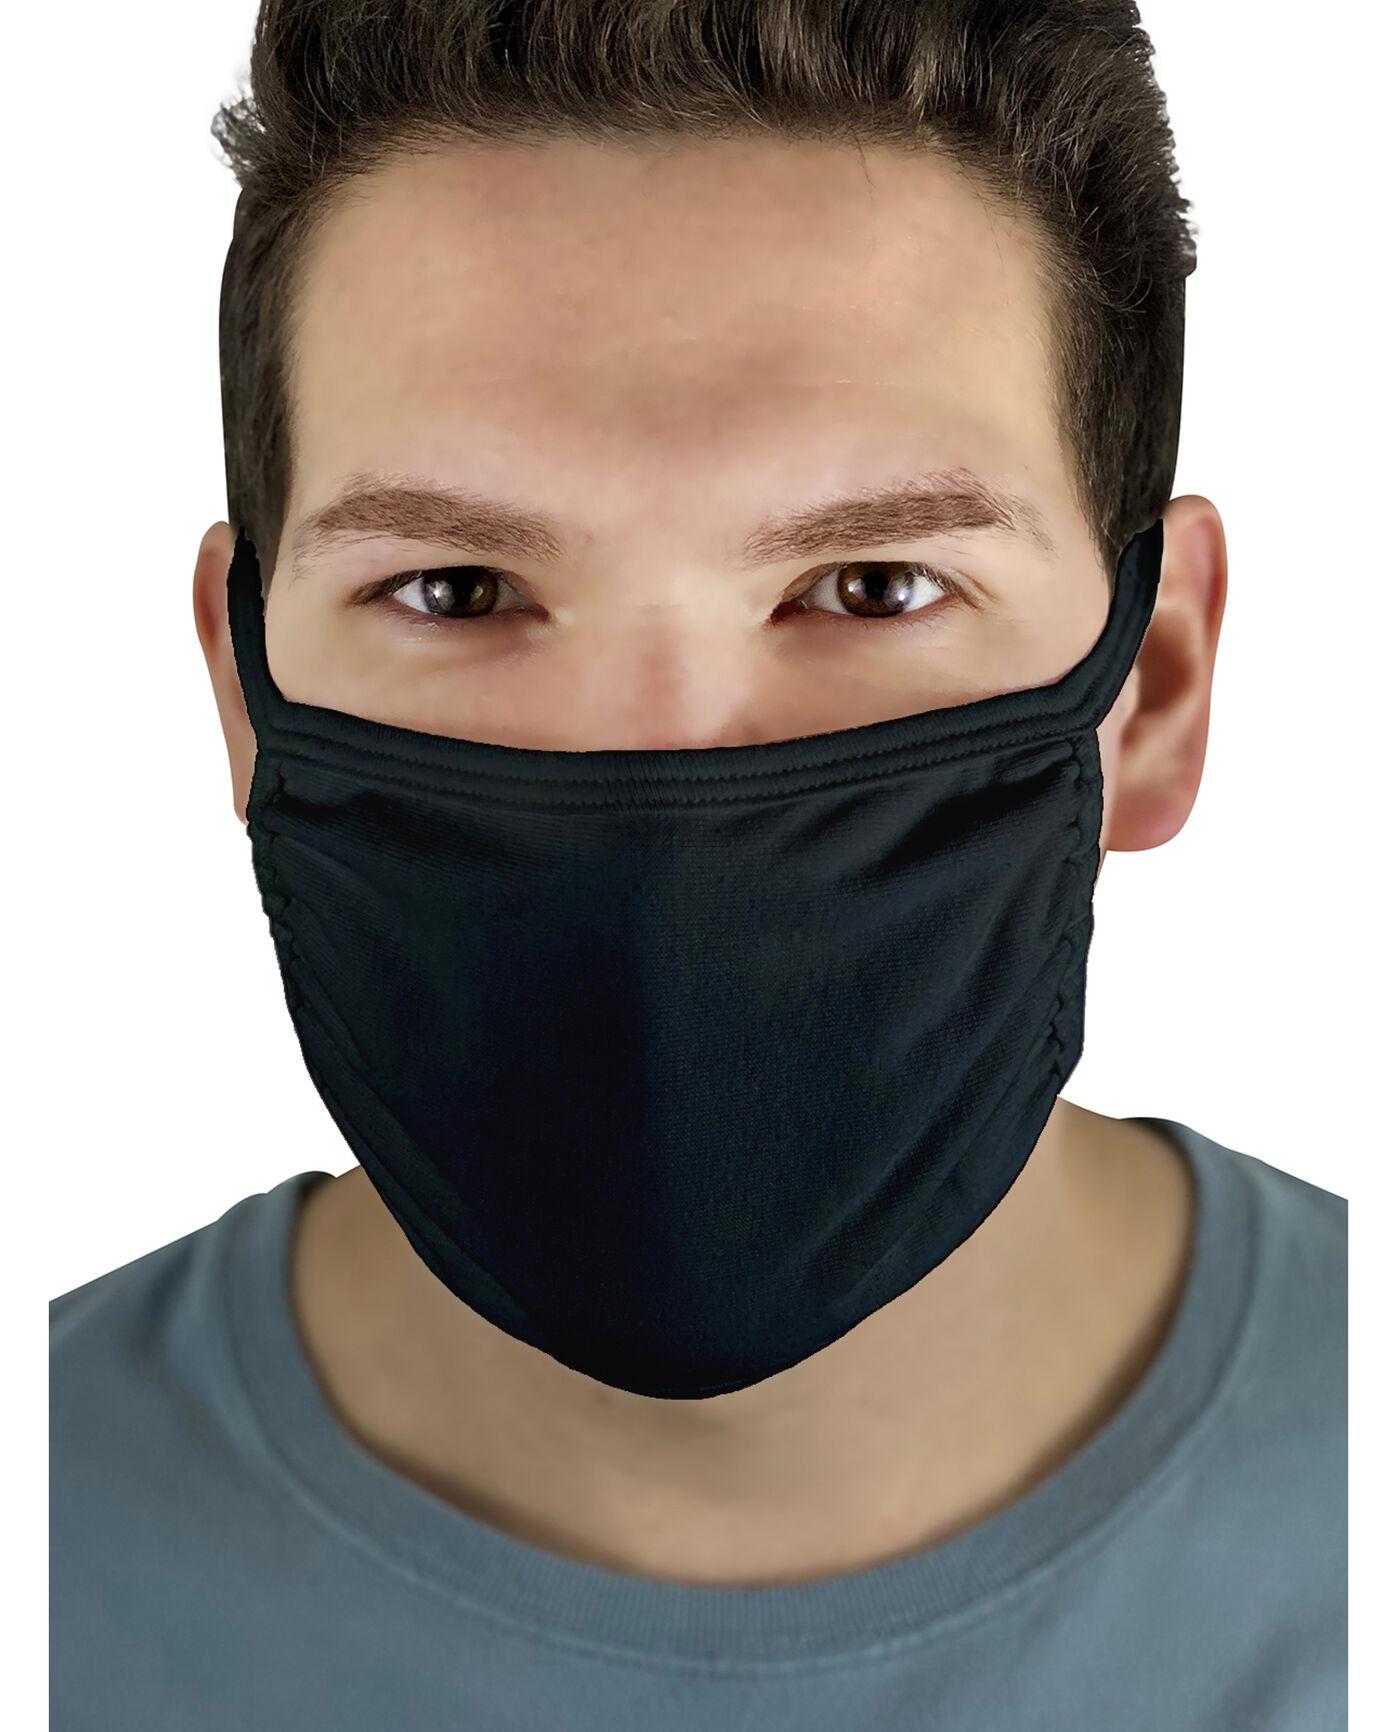 fruit of the loom cotton face mask, best face masks